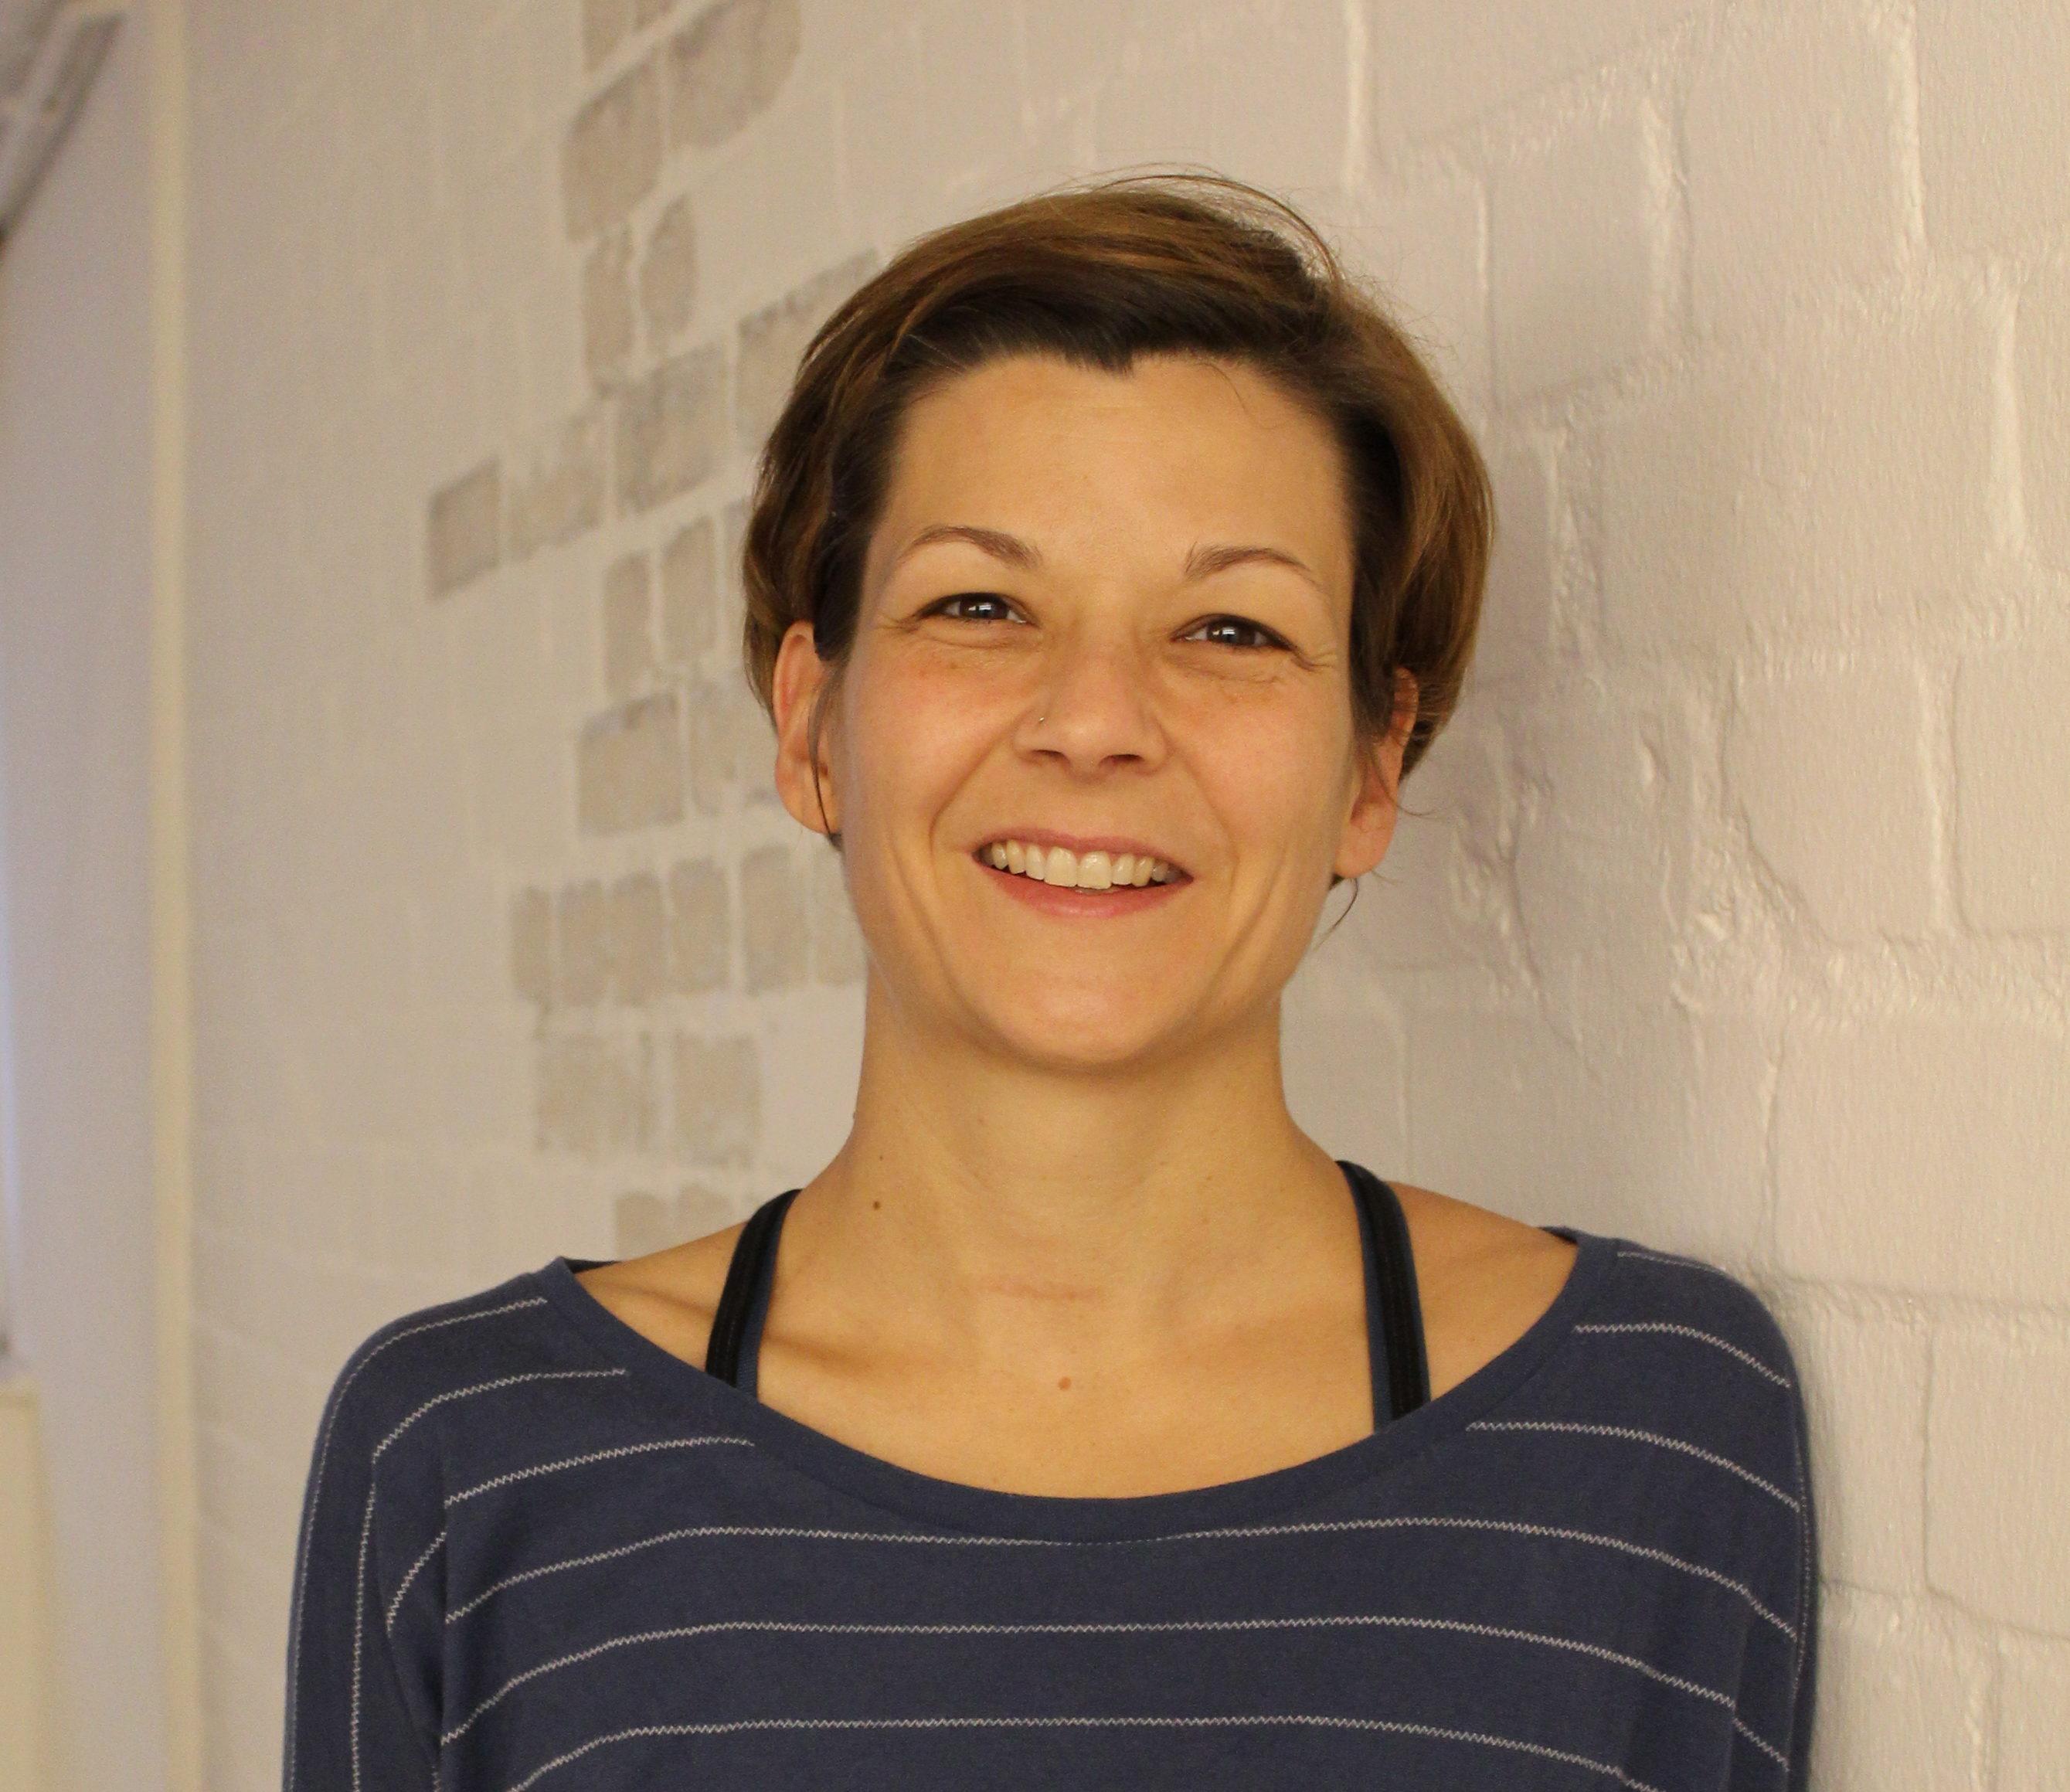 Lisa Wolk